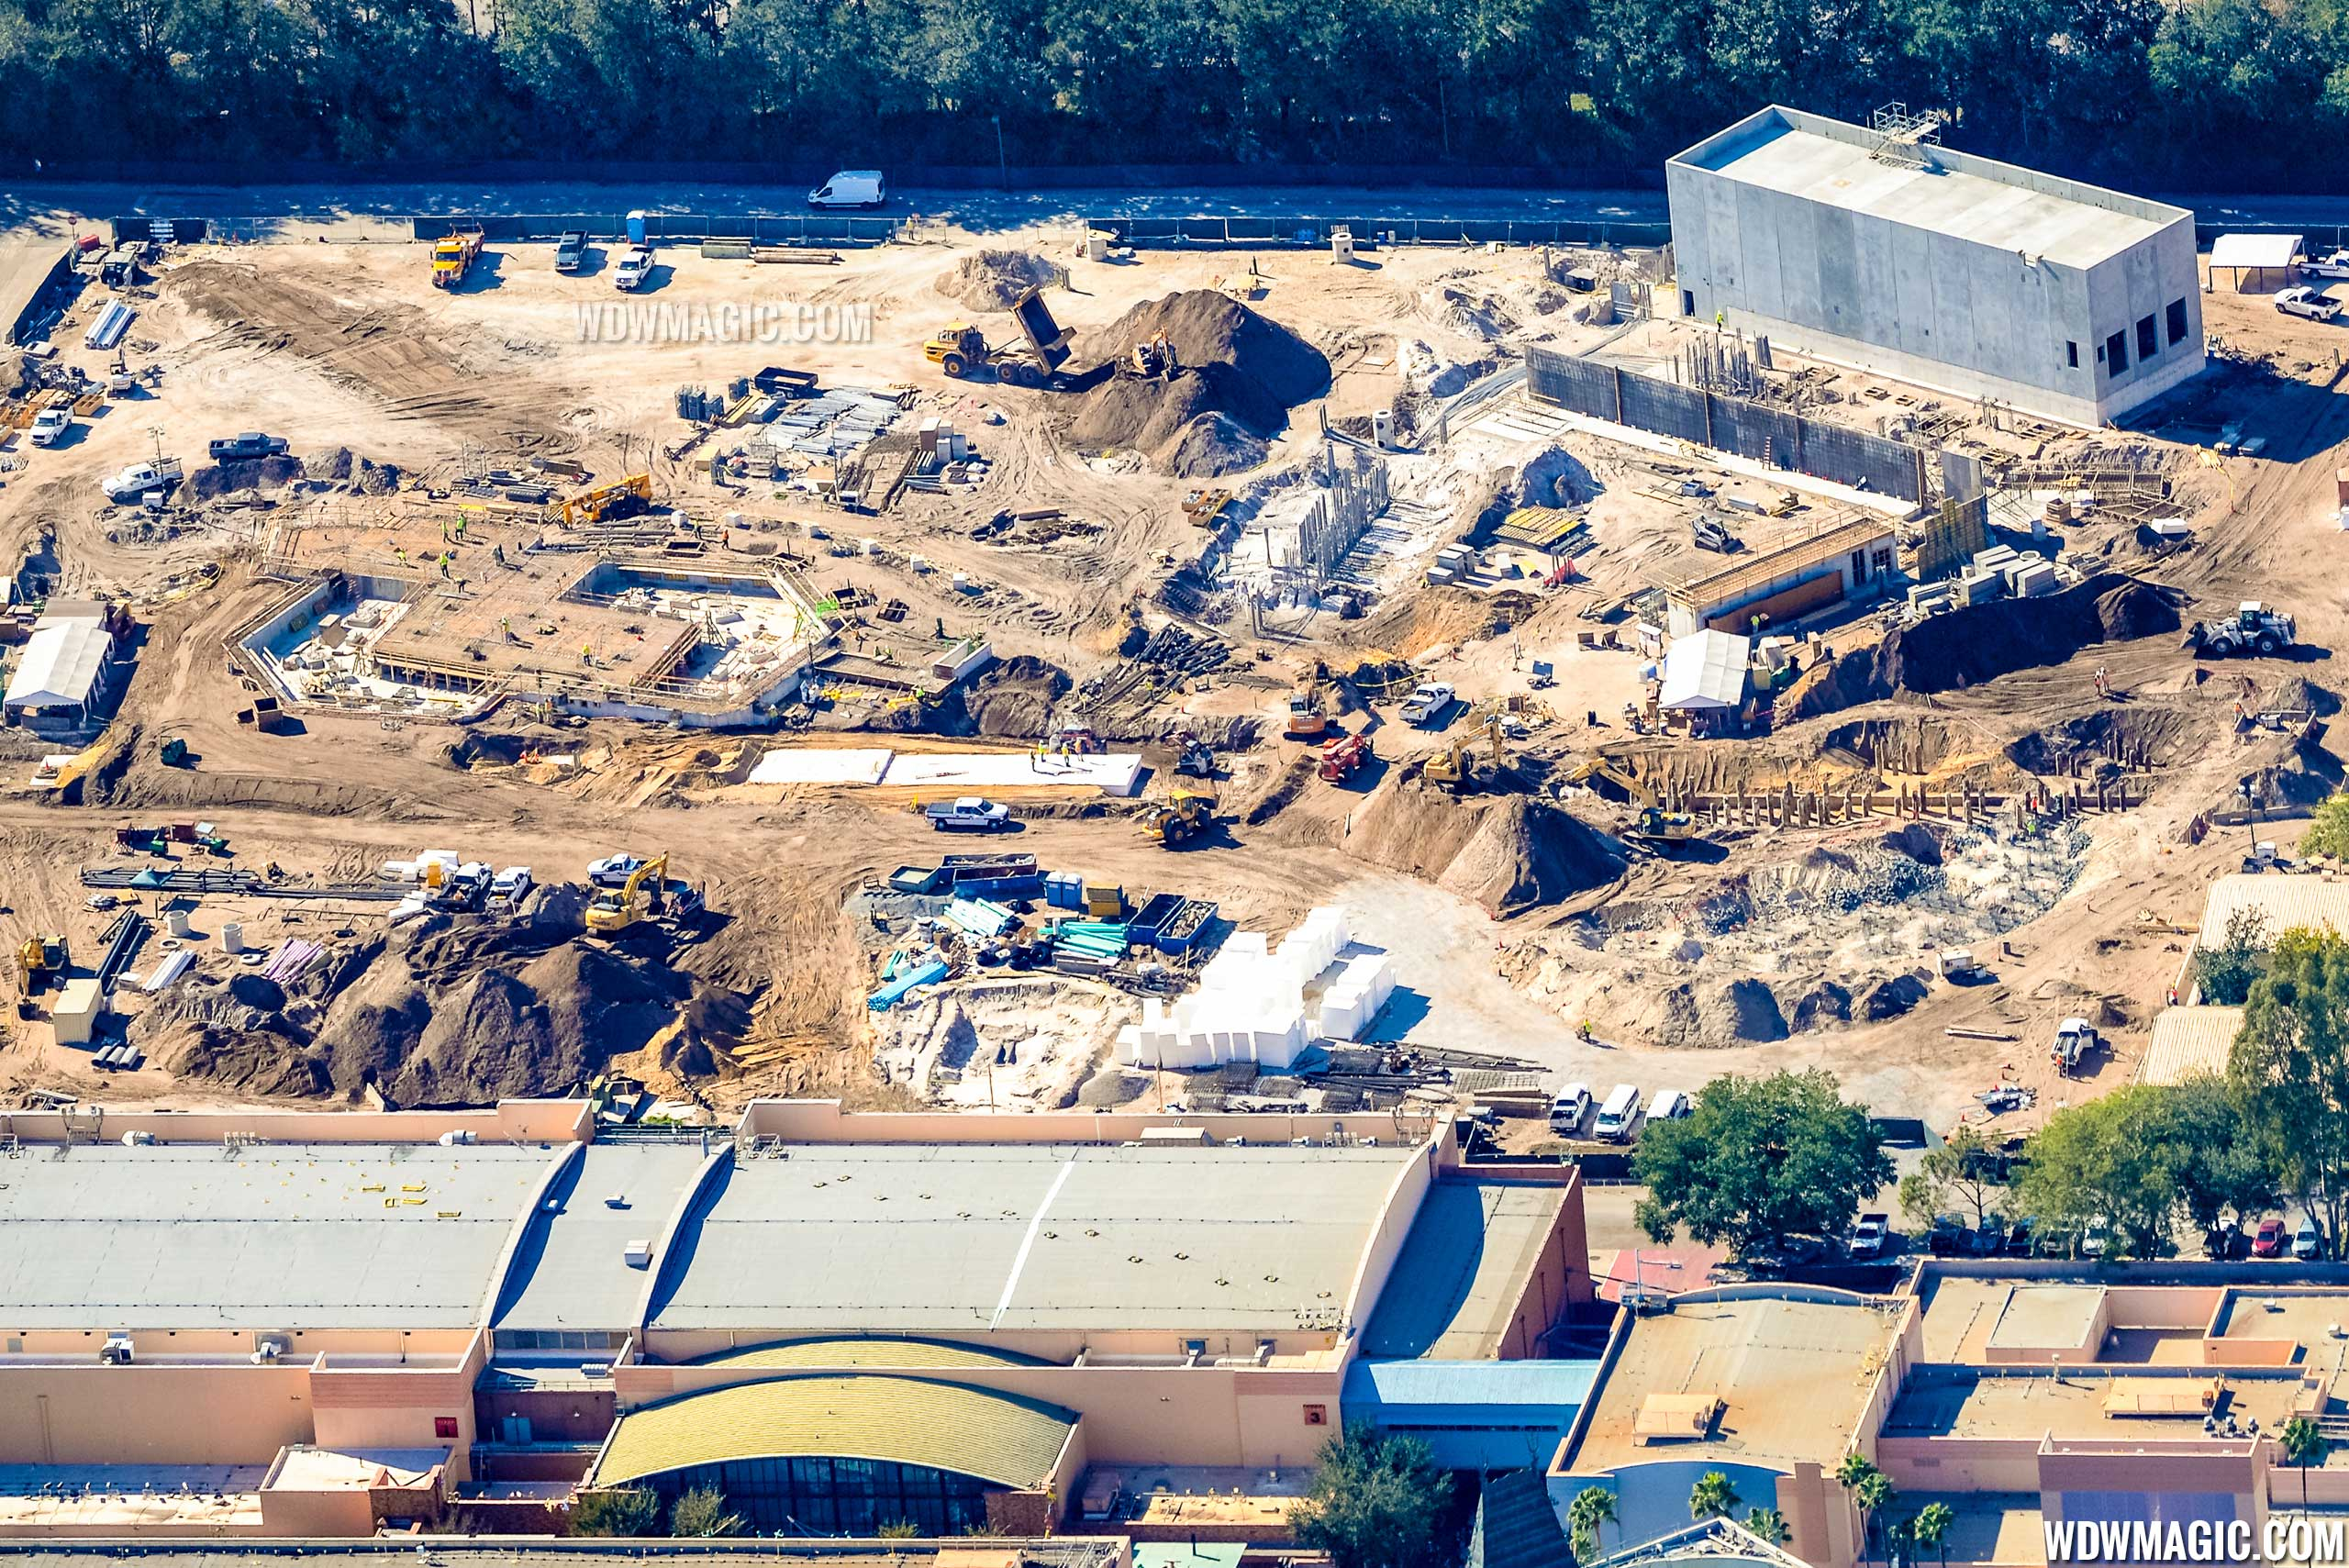 Photo by CJ Berzin @BerzinPhotography. Toy Story Land aerial view.